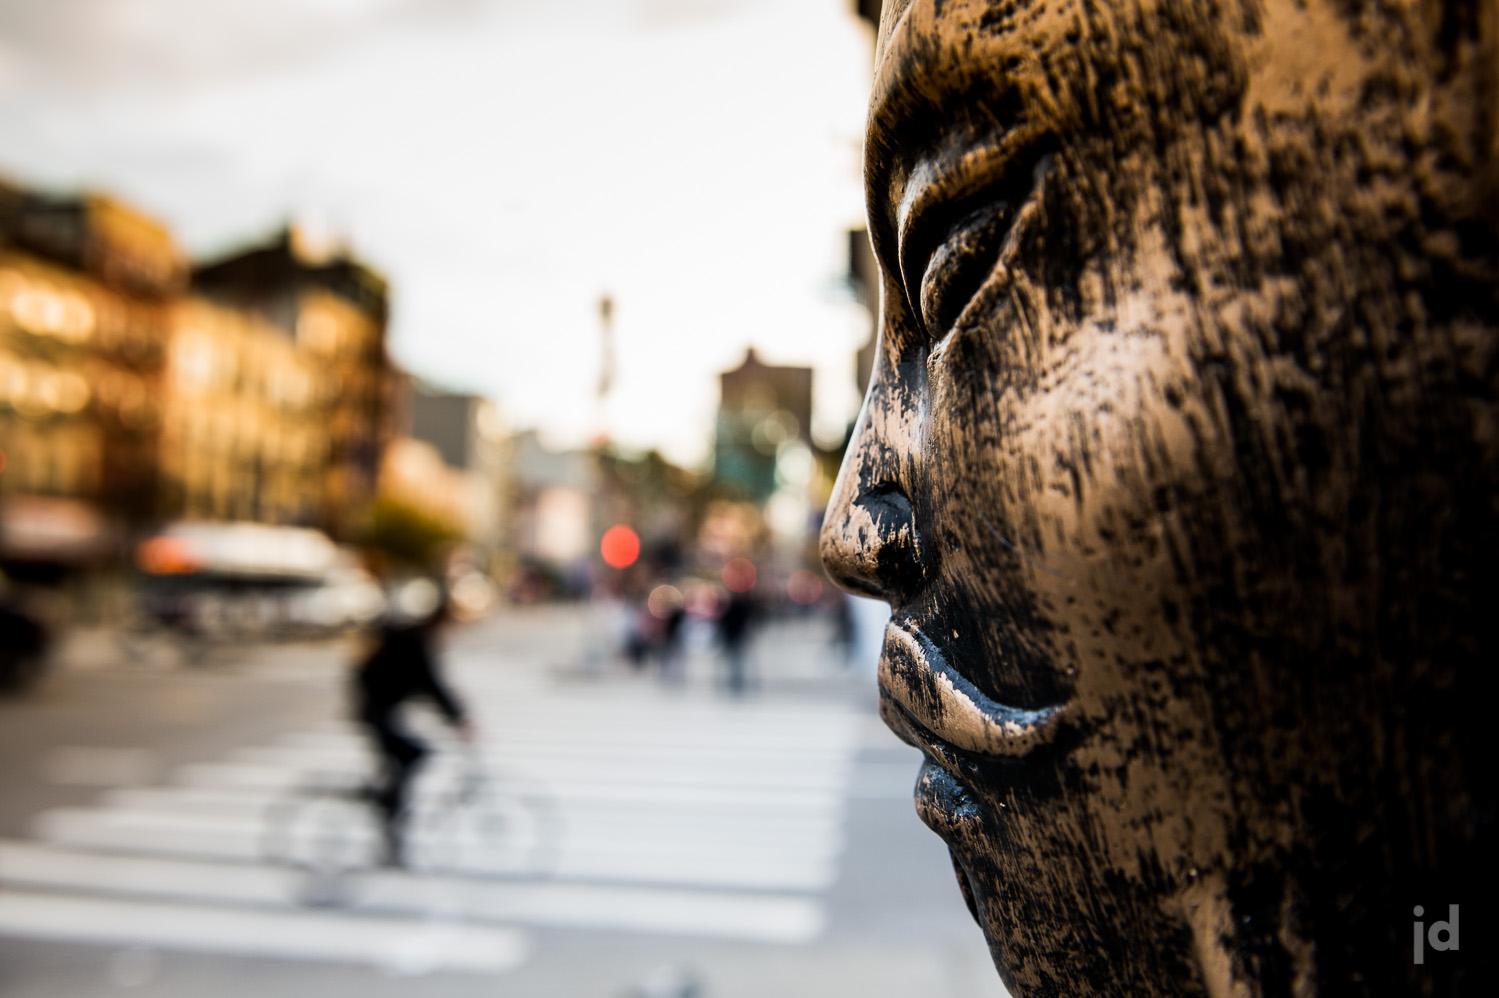 NewYork_USA_Photography_Jason_Davis_Images_003-3.jpg